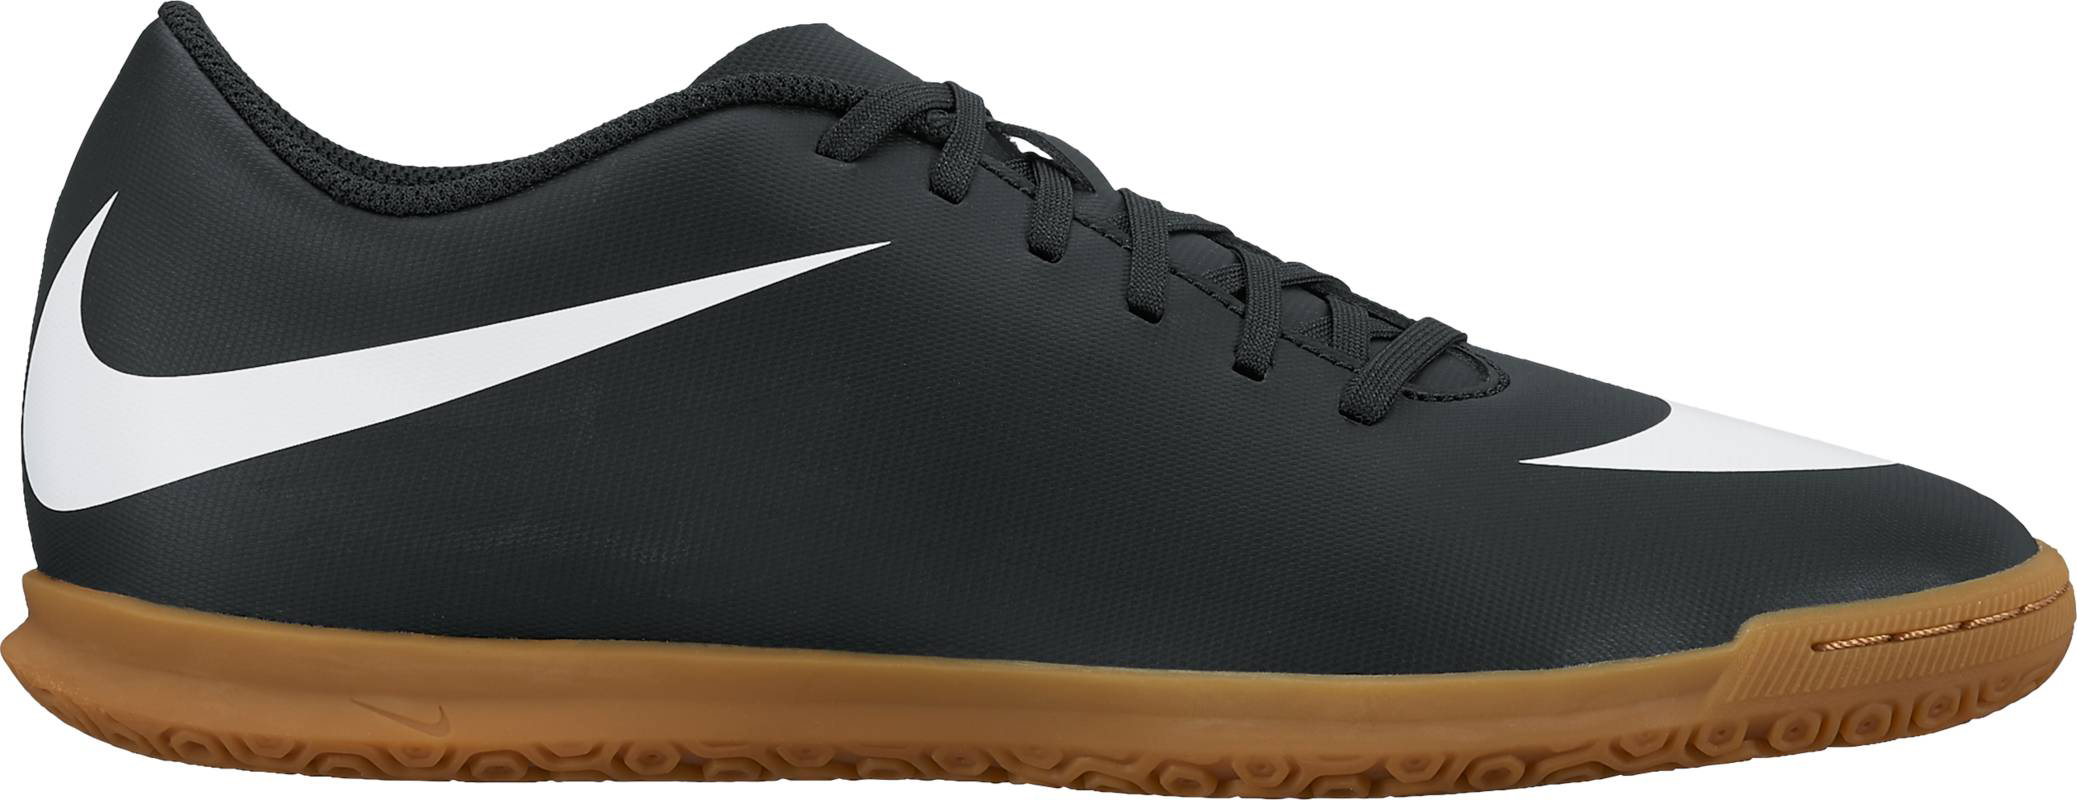 Бутсы мужские Nike Bravatax Ii Ic, цвет: черный. 844441-001. Размер 12 (45)